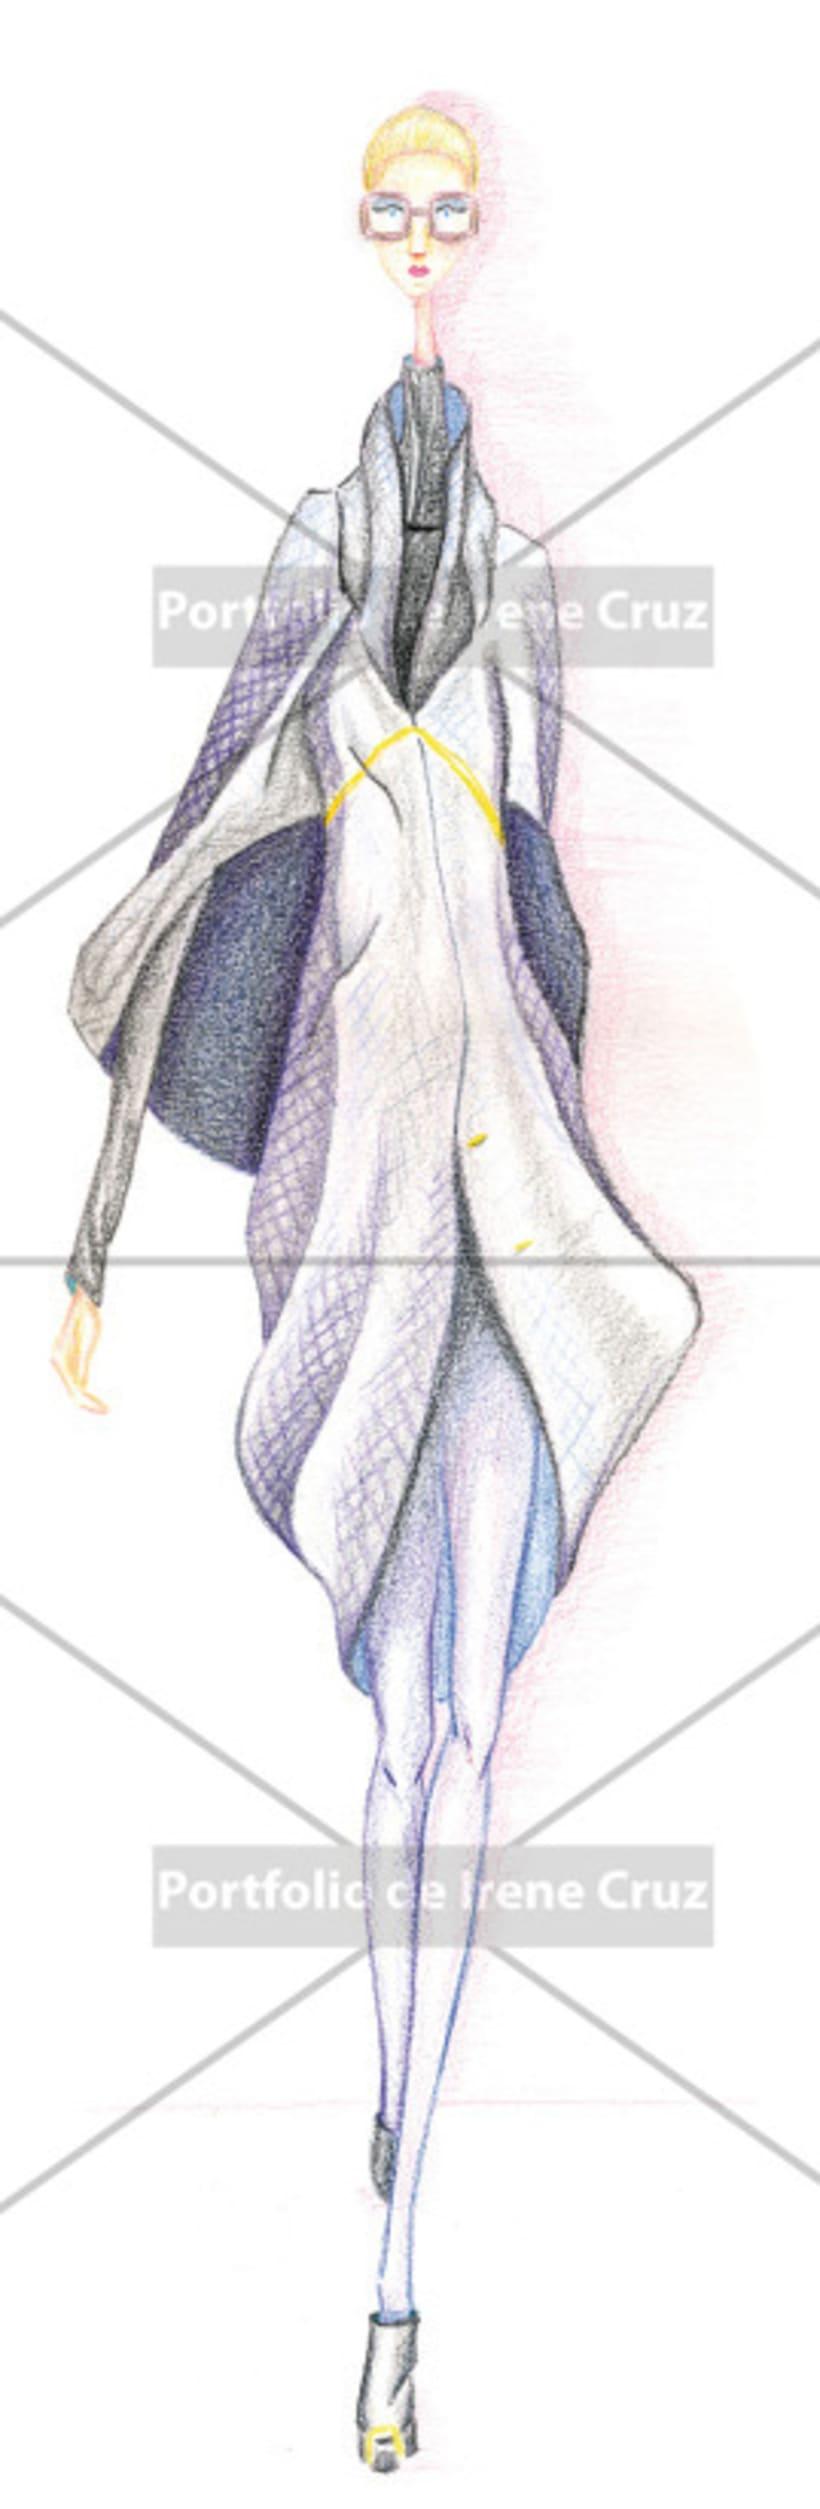 Illustrations 6